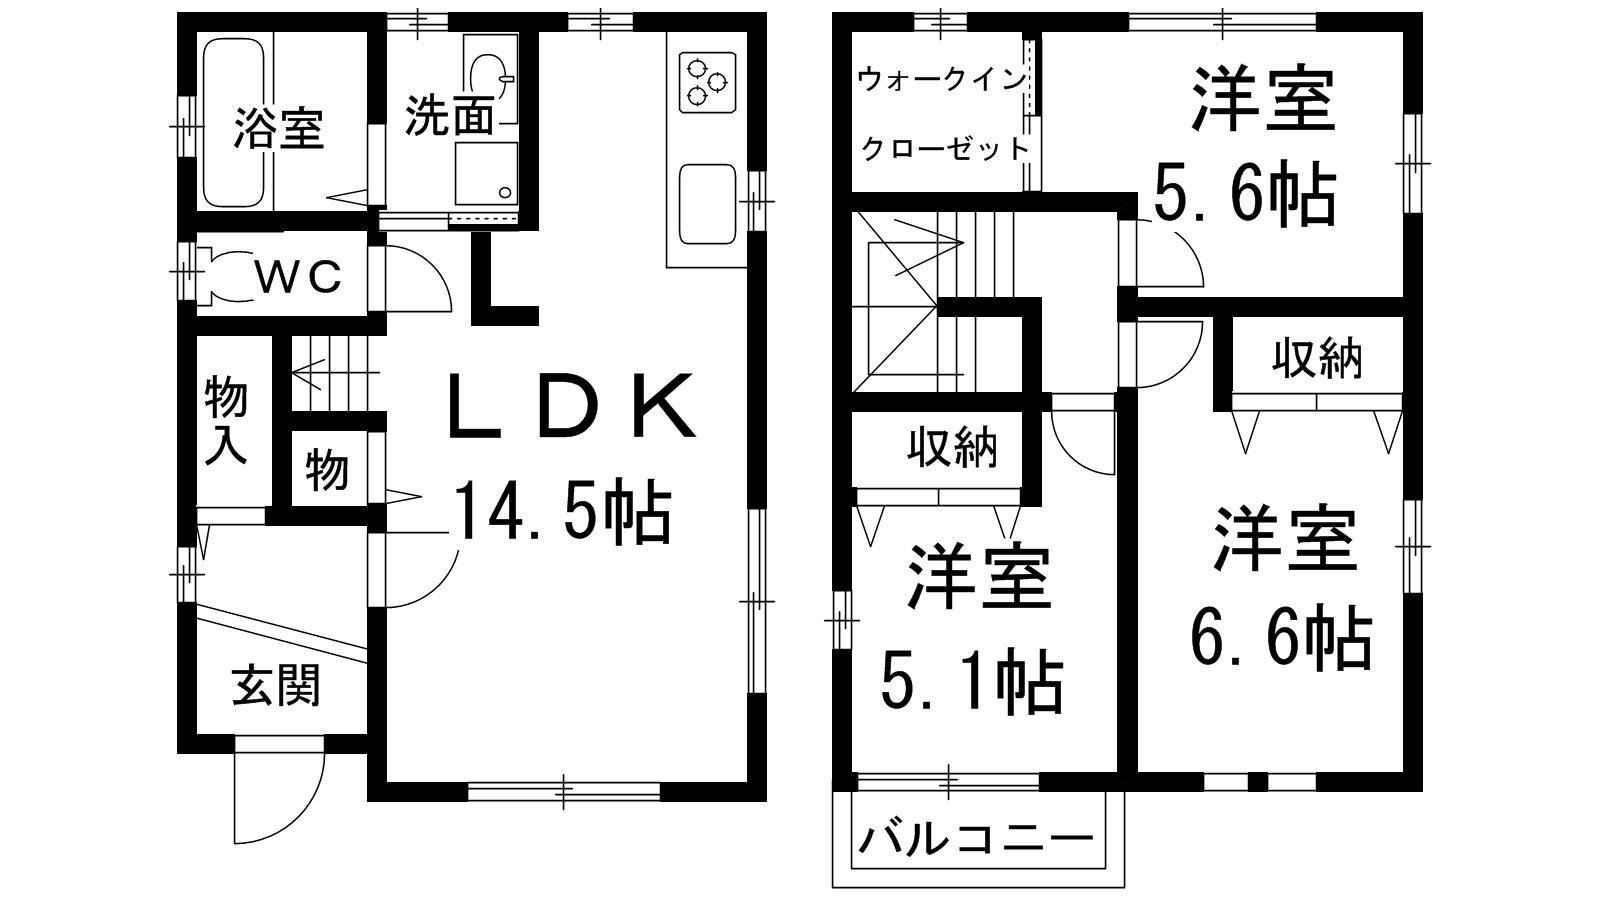 (3LDK) フジパレス戸建賃貸尾生町5